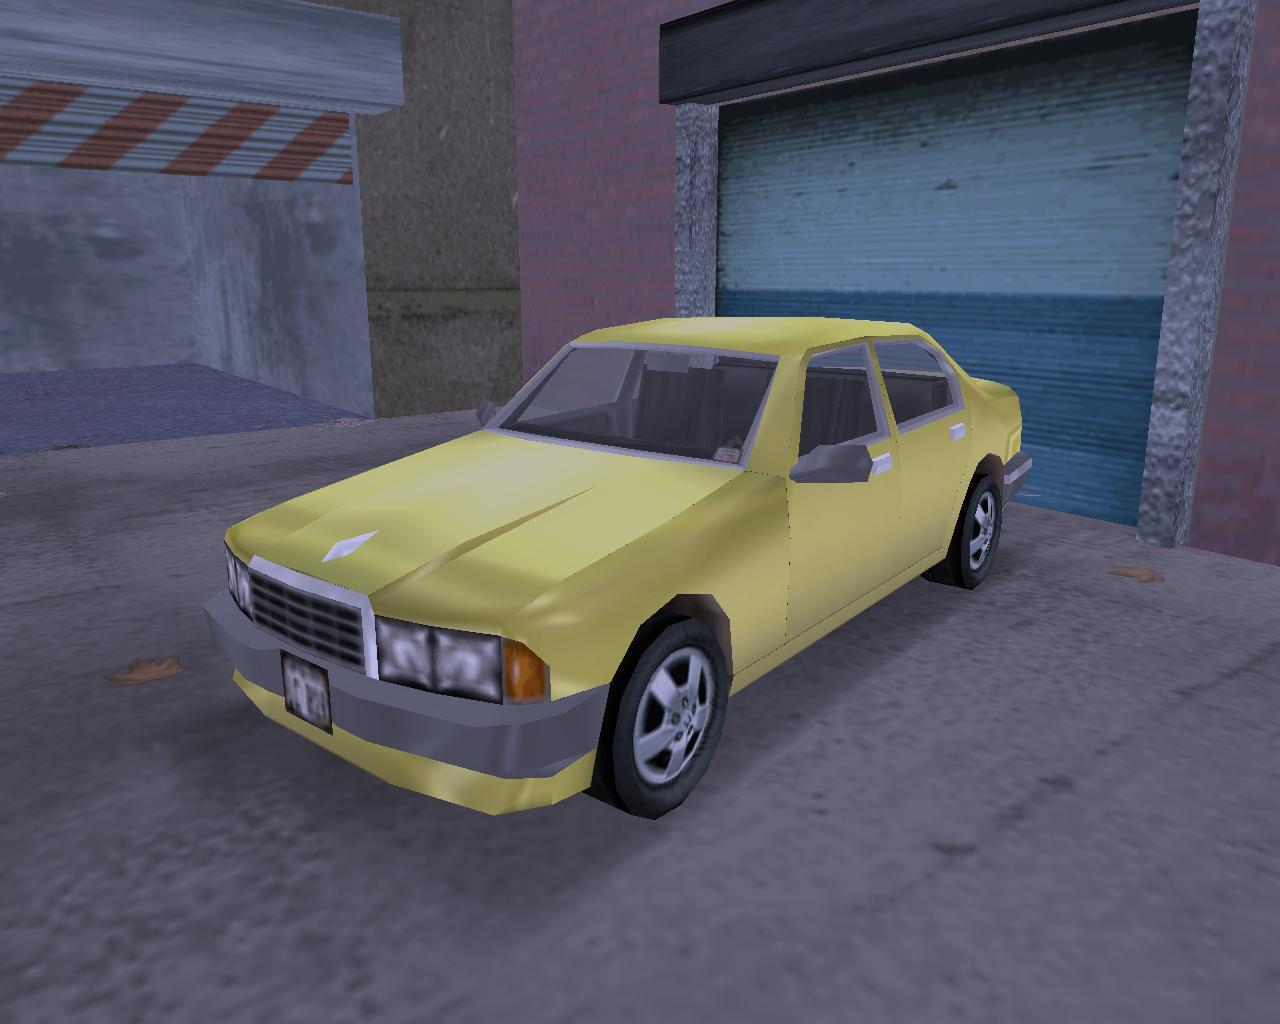 15. Sentinel (IH) - Grand Theft Auto 3